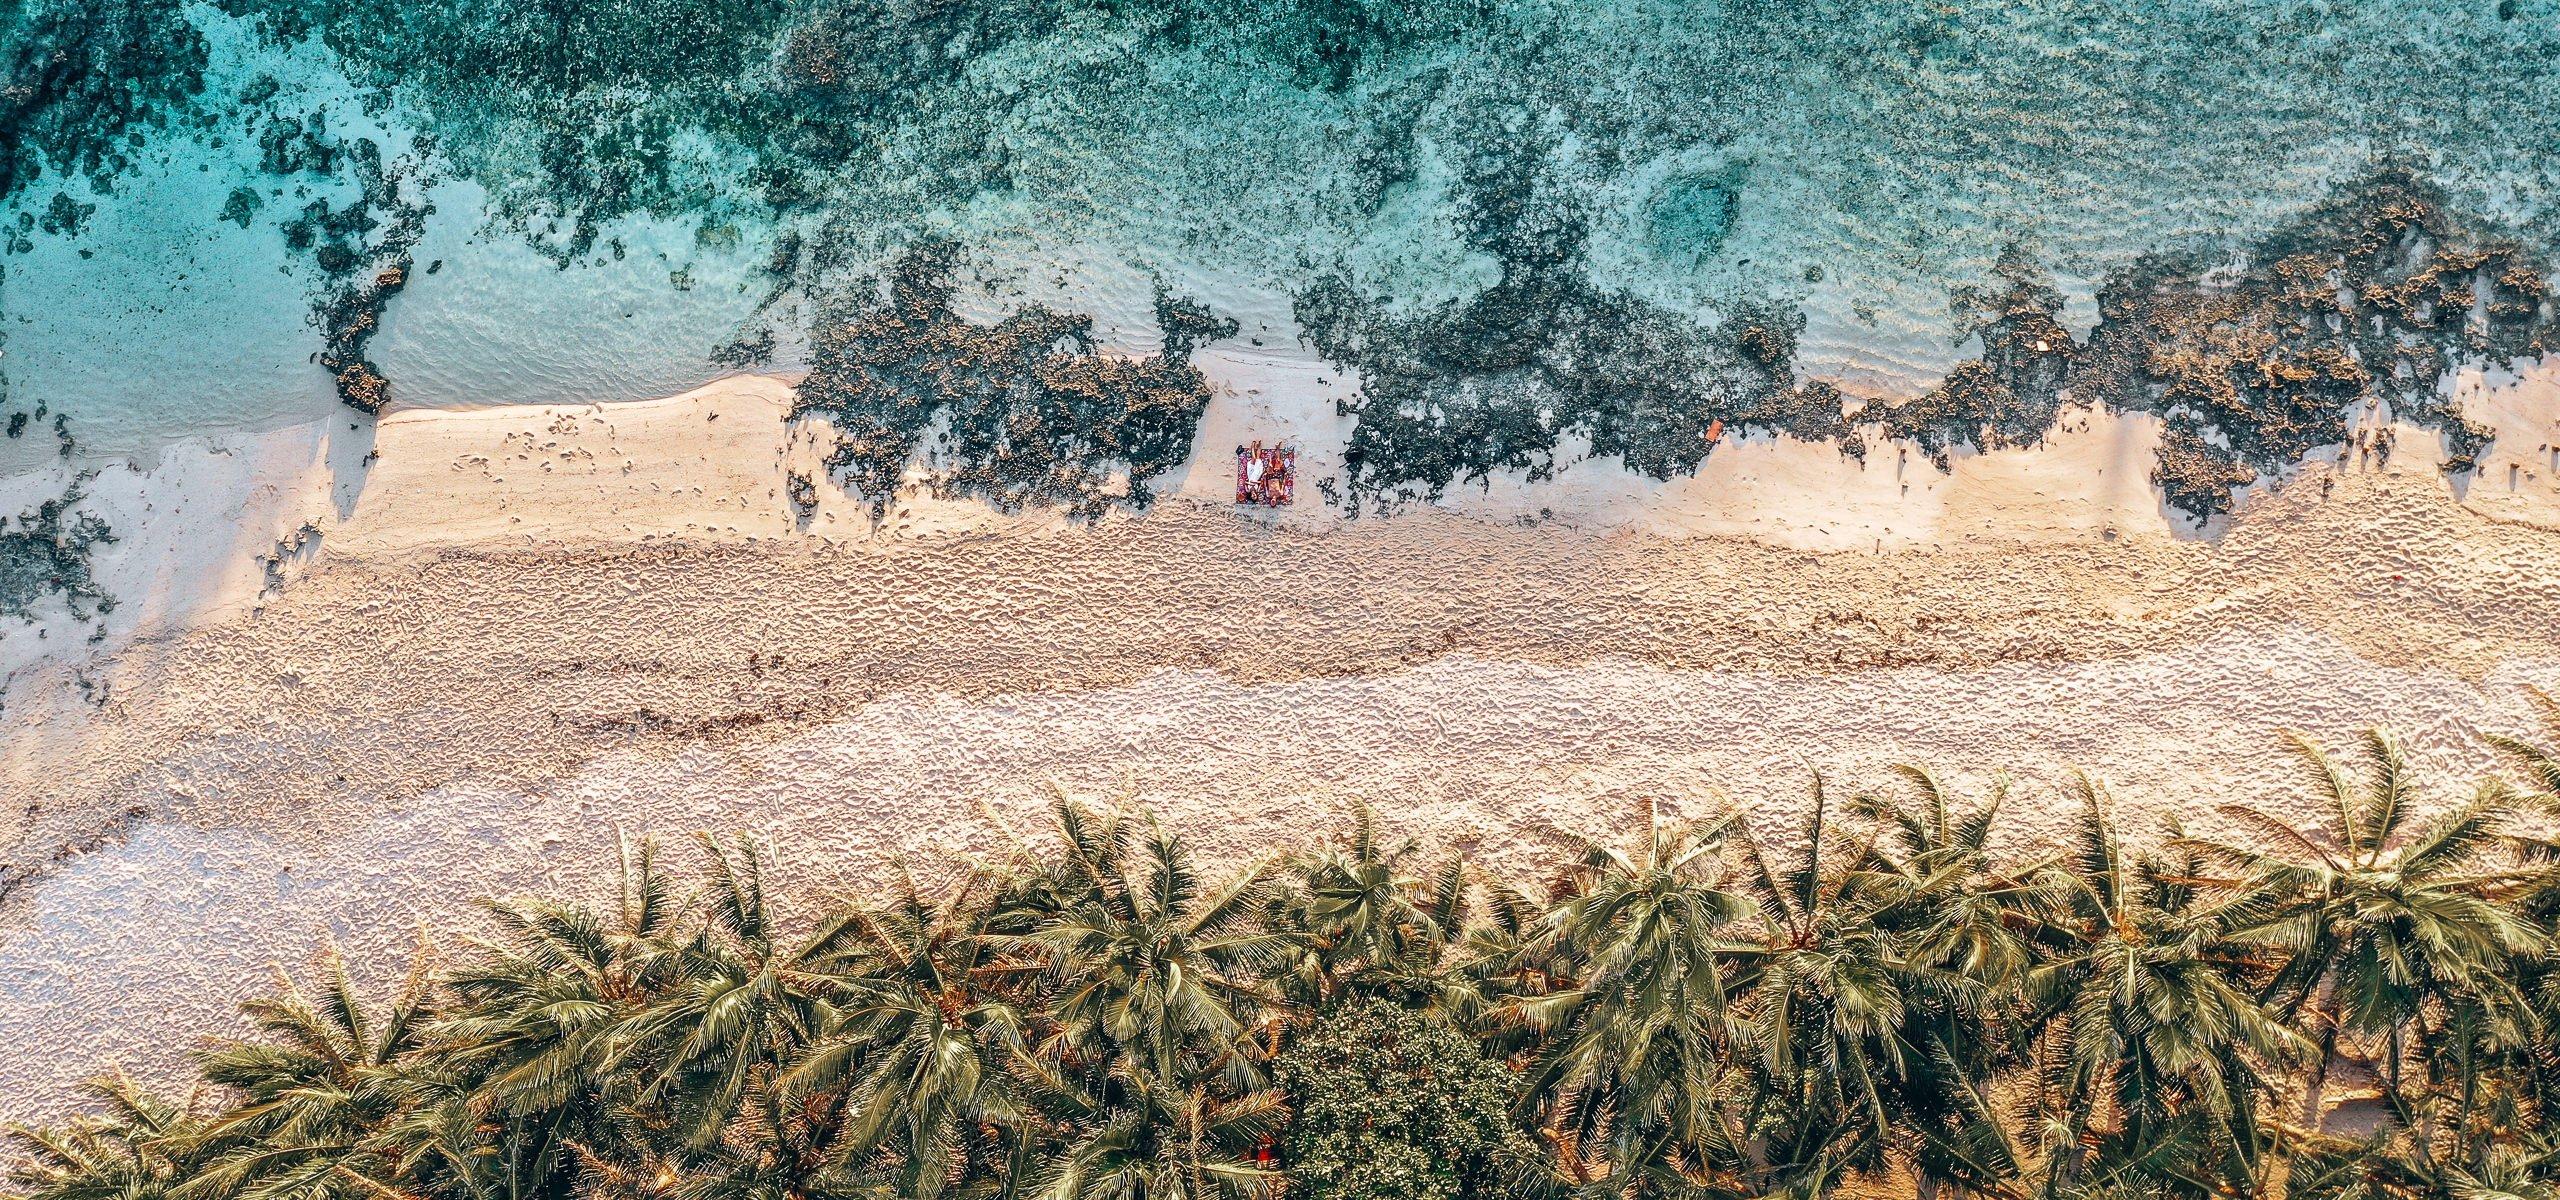 Siargao Island Travel Guide for Non-Surfers